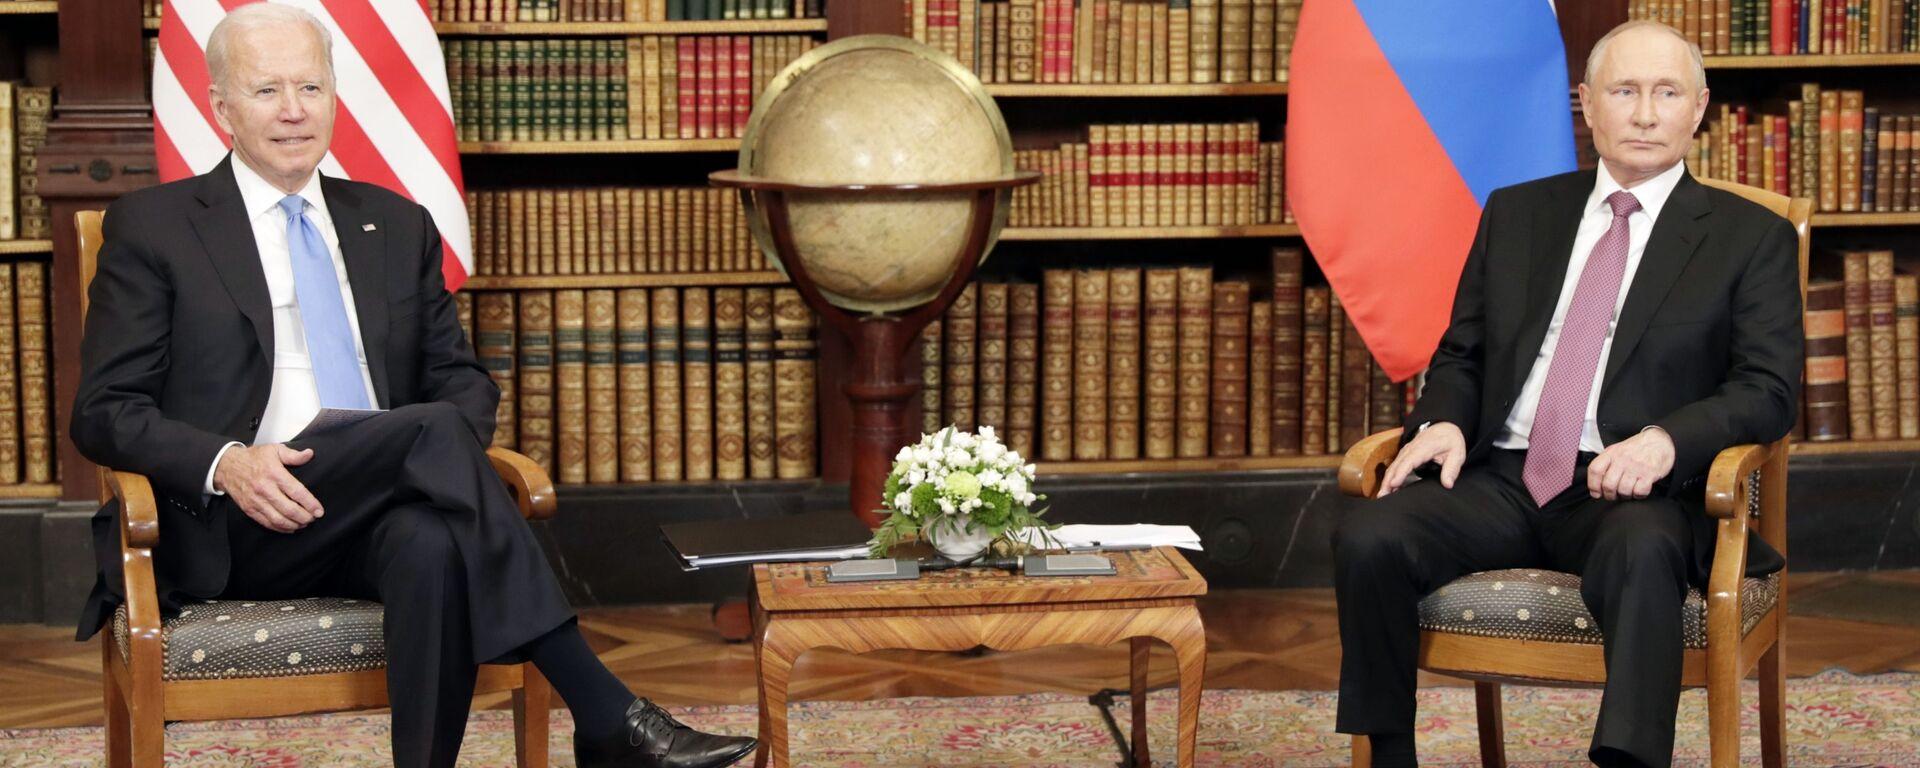 Russian President Vladimir Putin and U.S. President Joe Biden, left, attend a meeting at the Villa La Grange in Geneva, Switzerland - Sputnik International, 1920, 20.08.2021